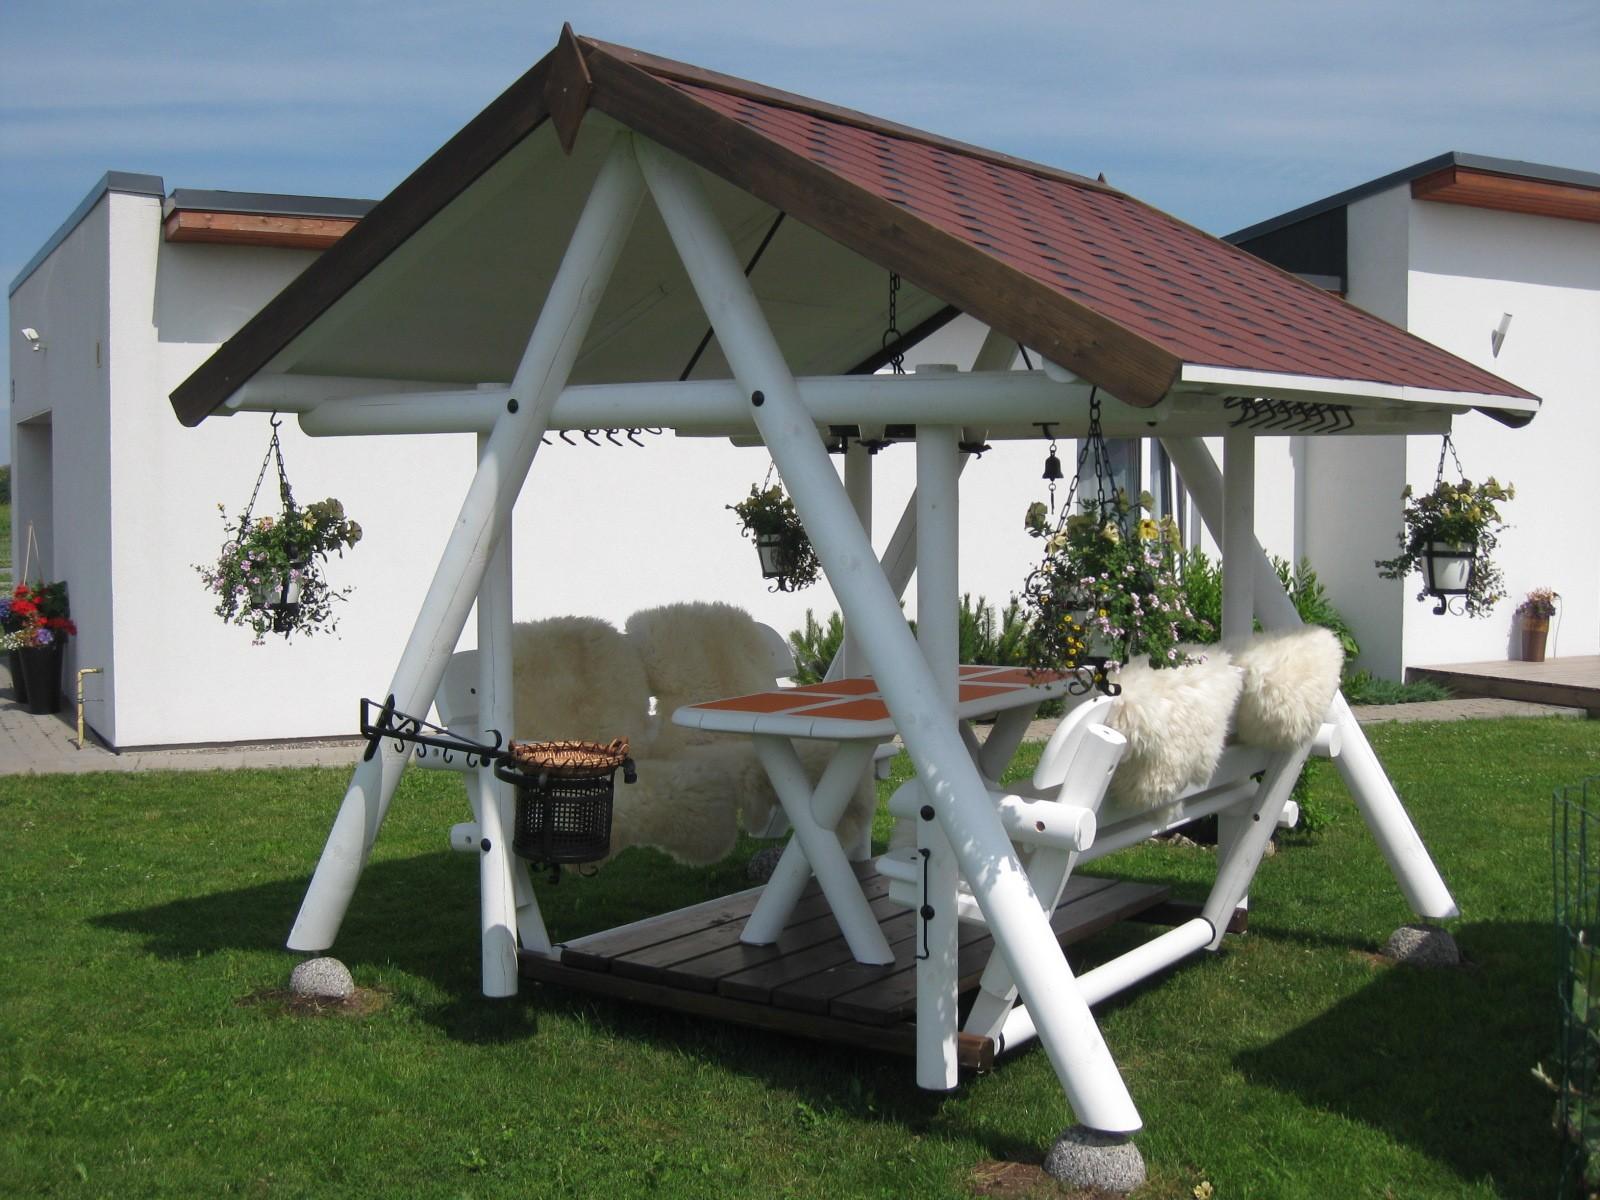 Full Size of Gartenschaukel Jack Grillschaukel Pavillon Finnwerk Wohnzimmer Gartenschaukel Erwachsene